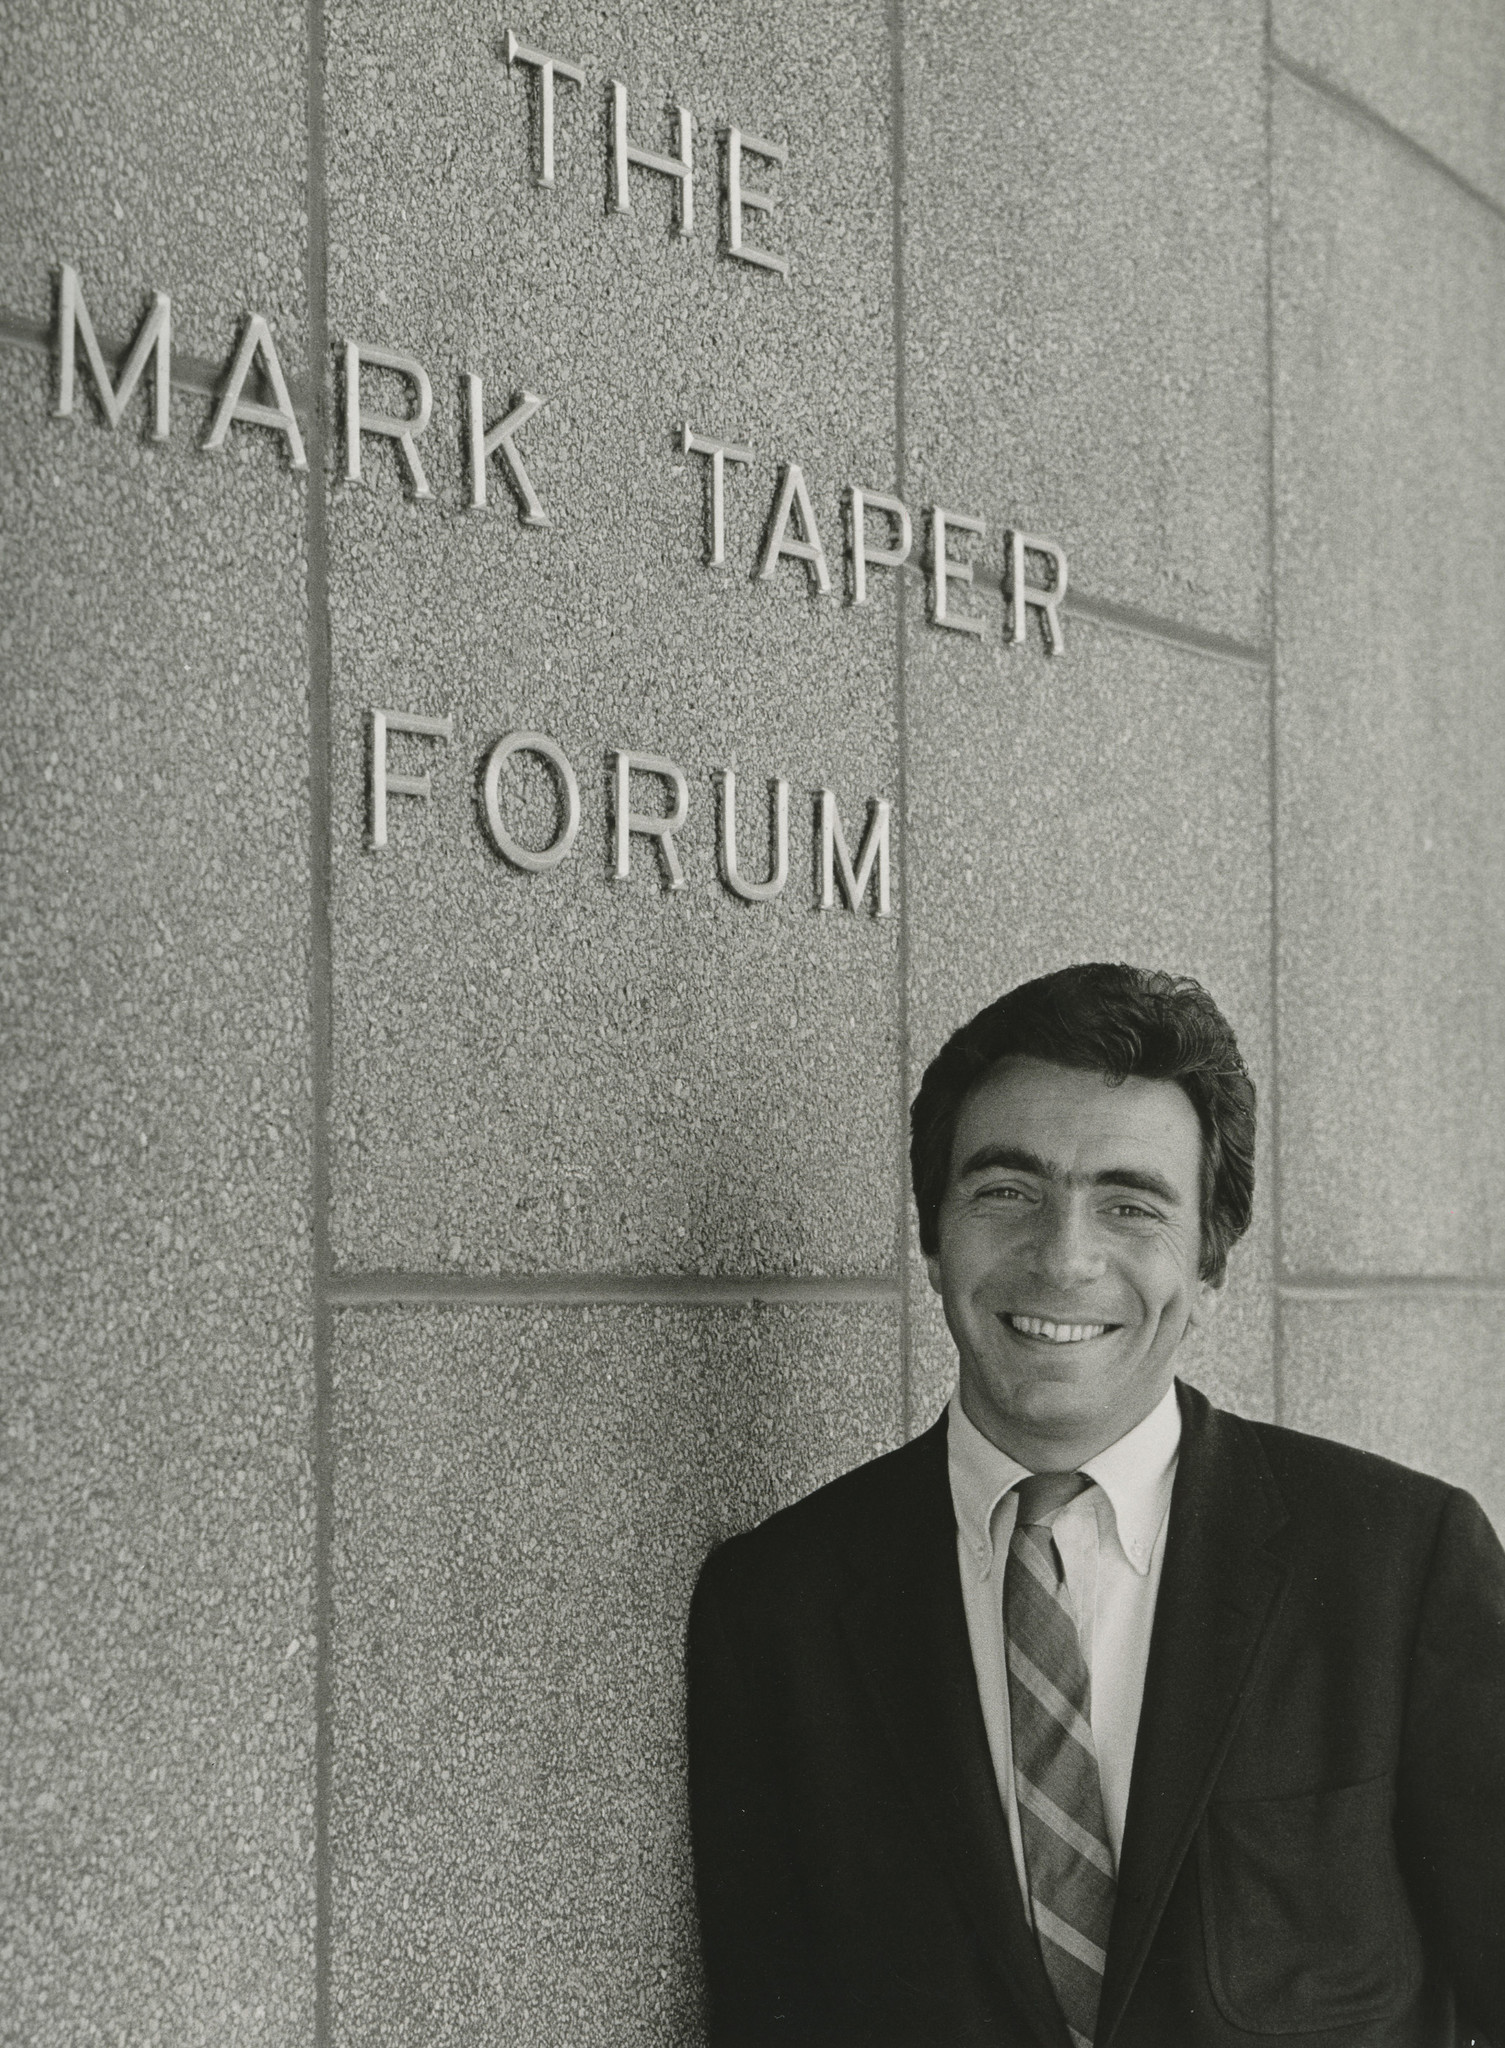 Gordon Davidson in an early year of his Mark Taper Forum tenure.